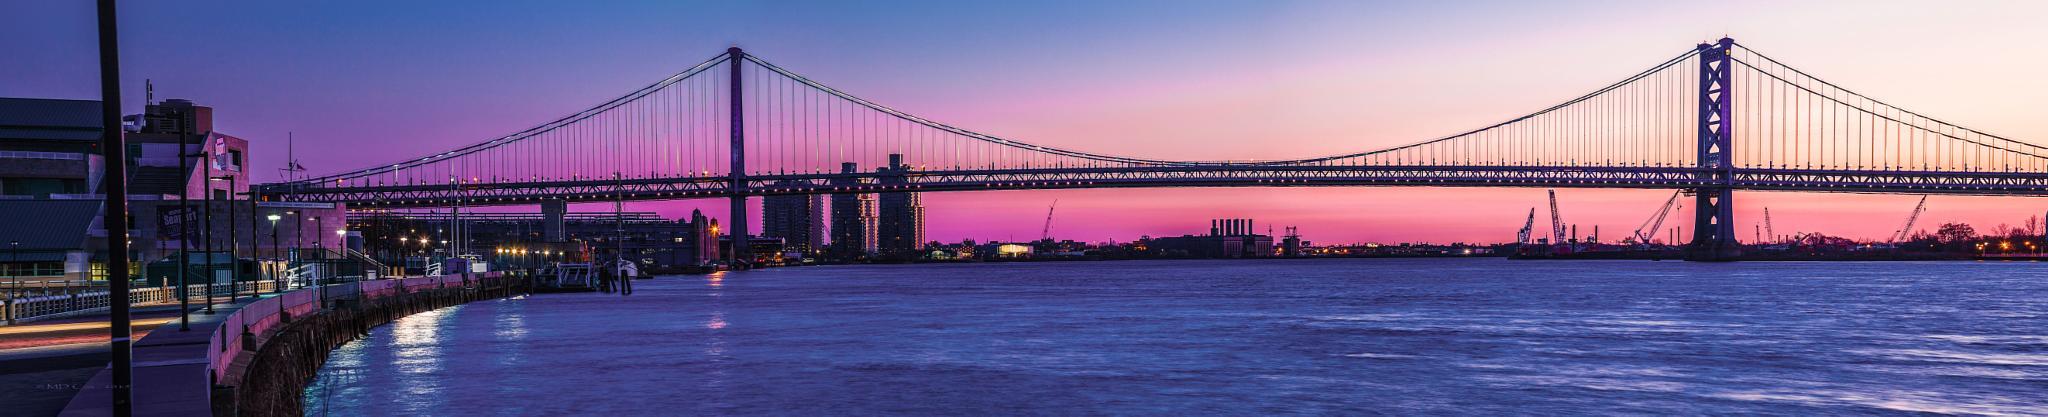 Benjamin Franklin Bridge by Michael Cox